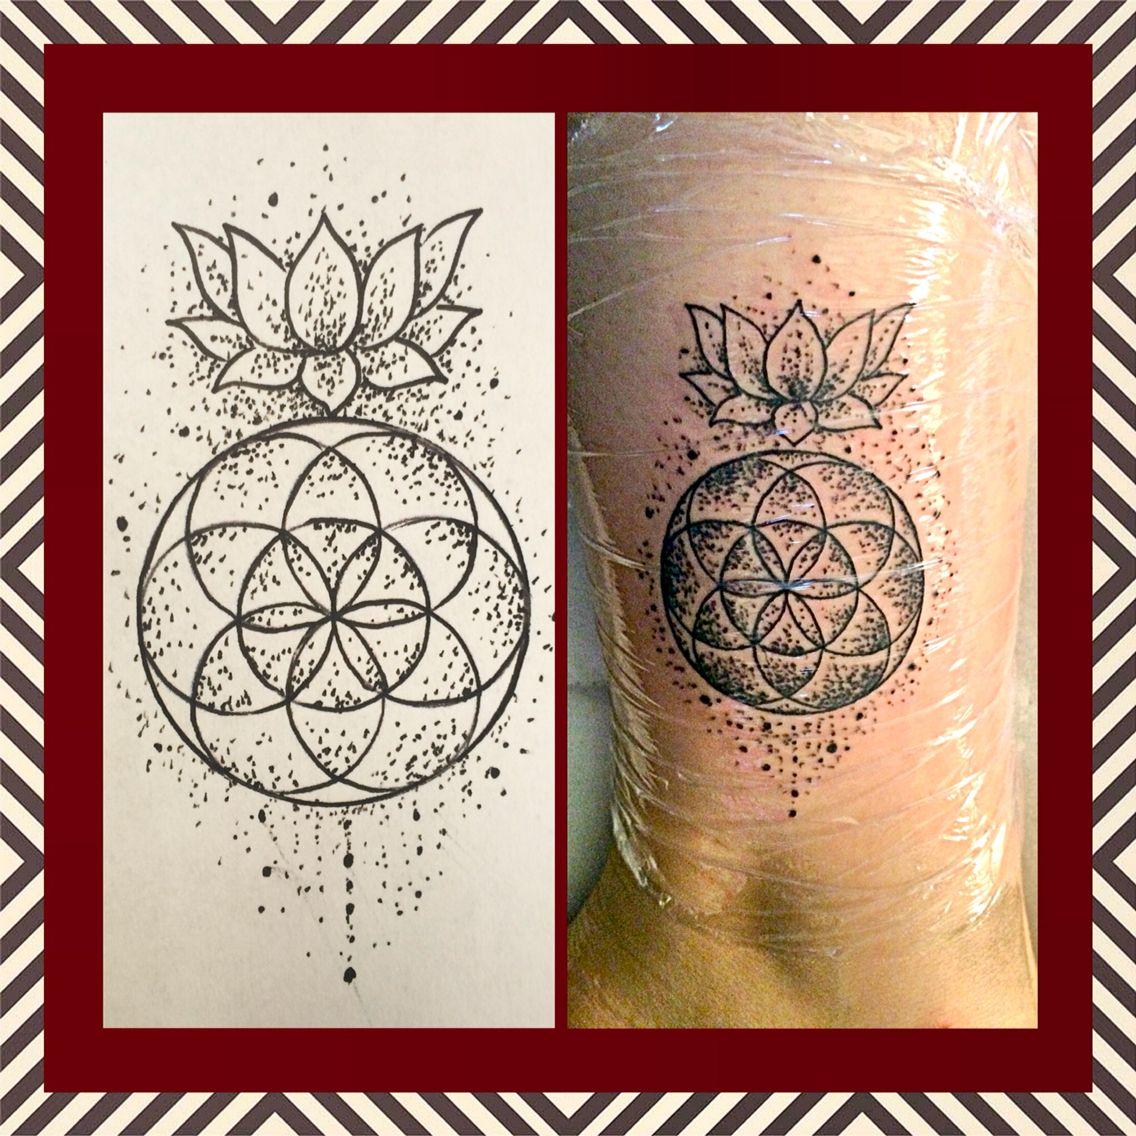 lotus tattoo my tattoo flower of life tattoo unique tattoo tattoos pinterest lebensblume. Black Bedroom Furniture Sets. Home Design Ideas